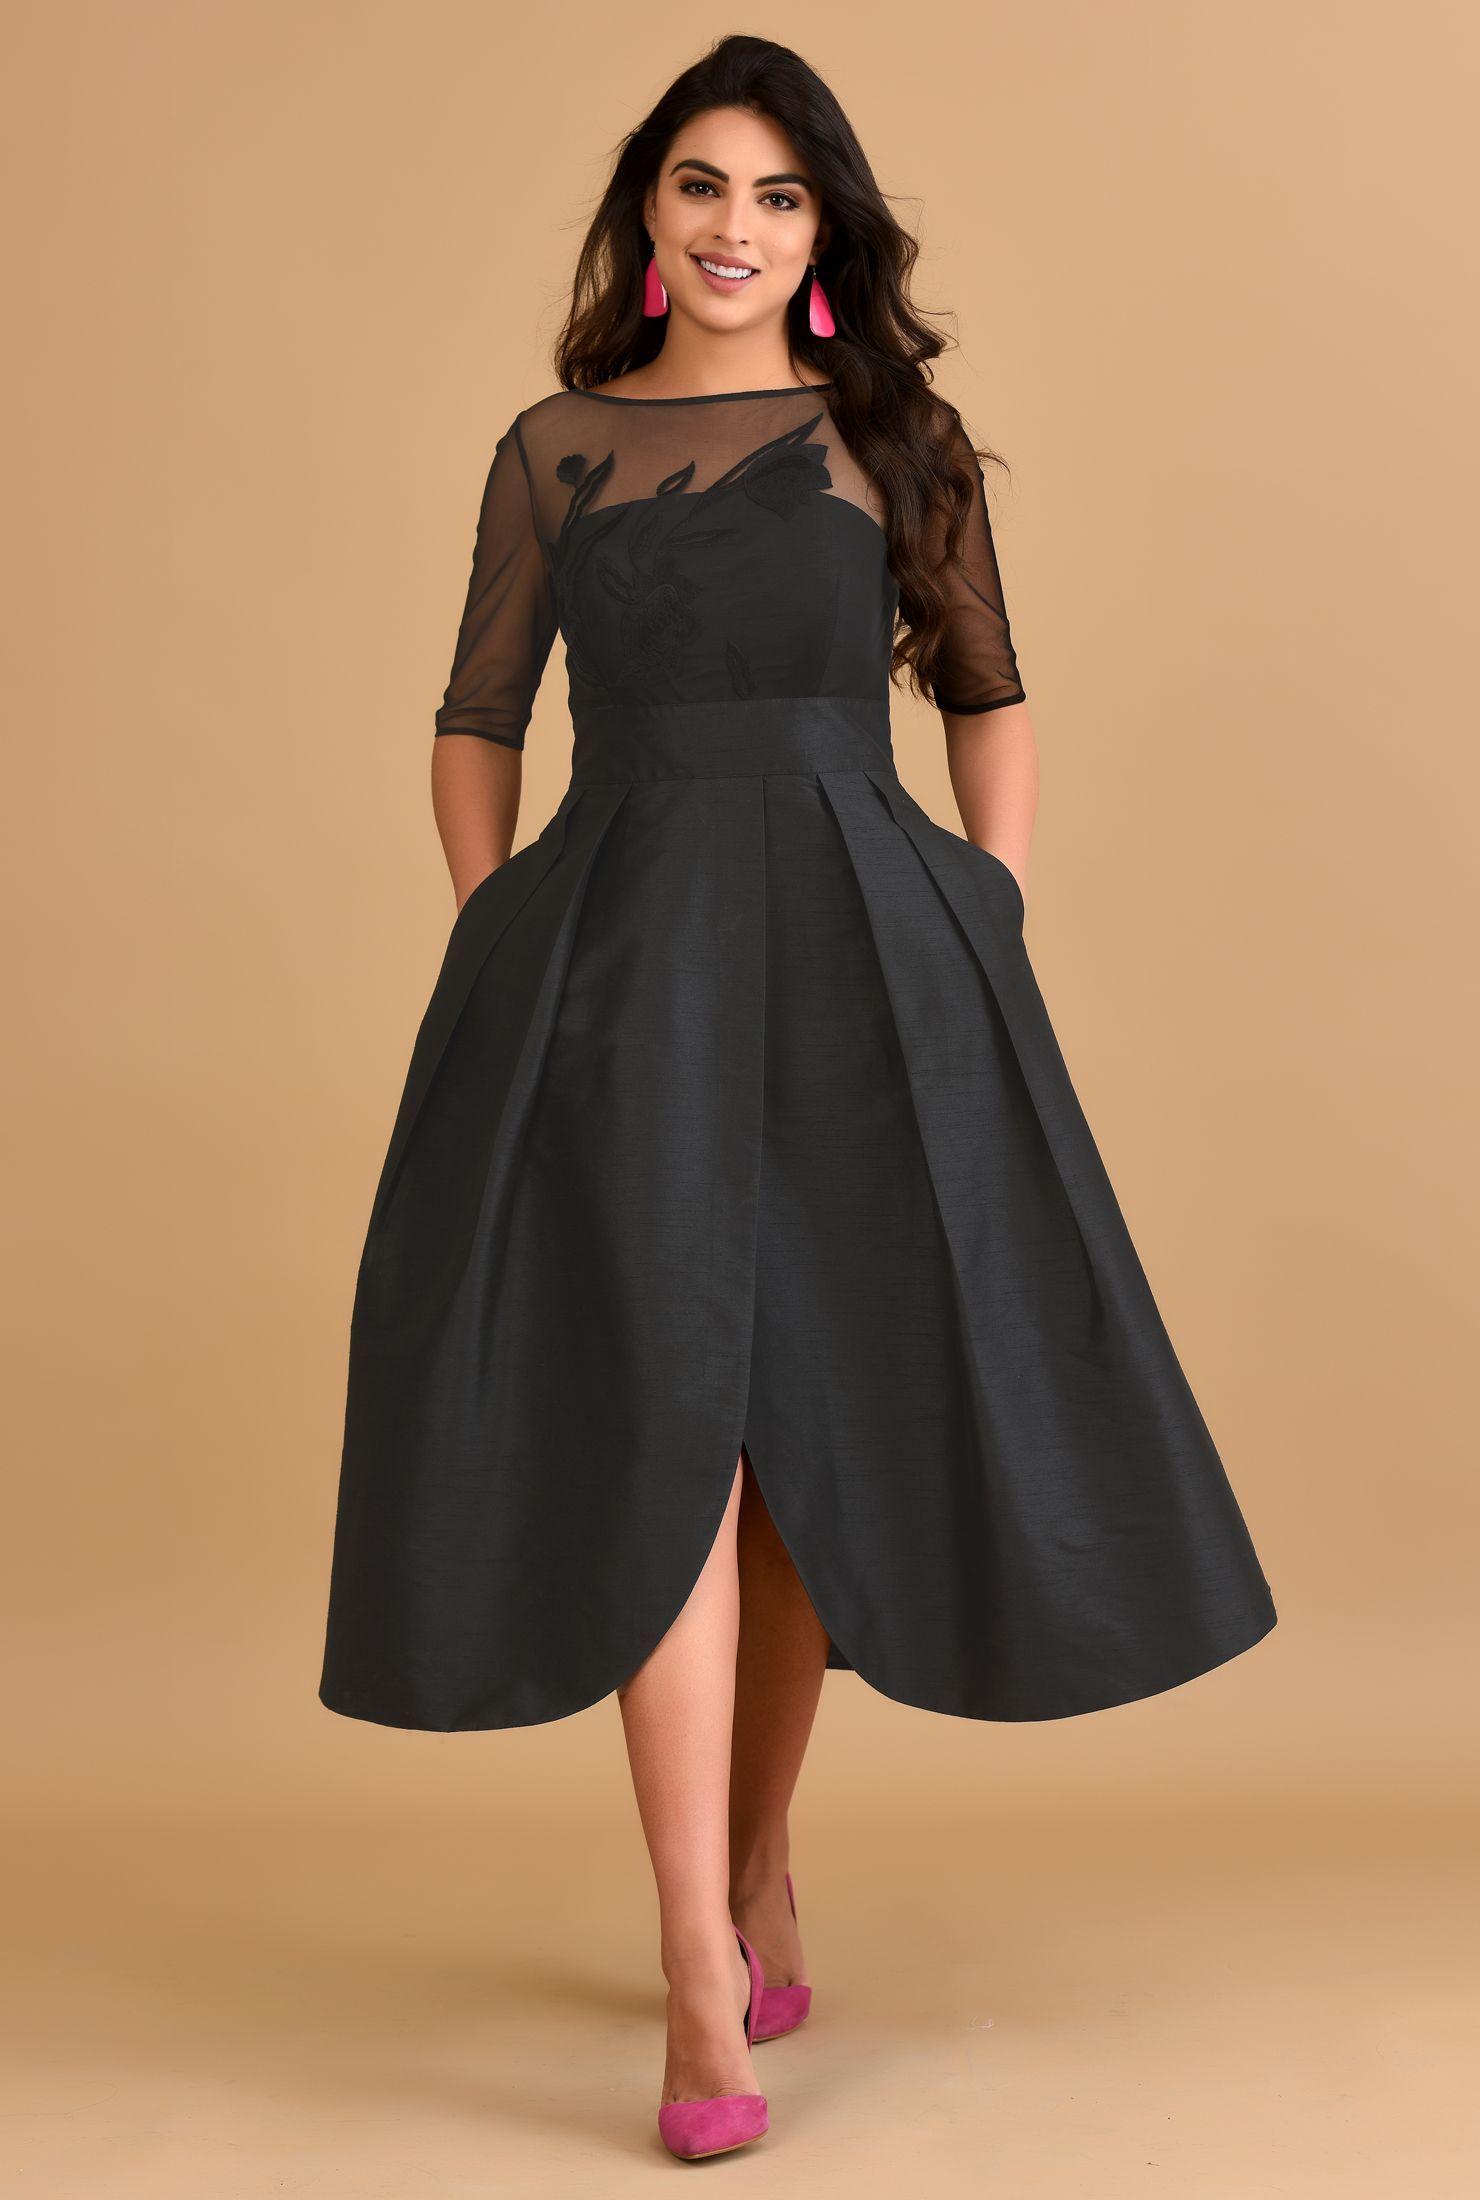 Back Zip Dresses Black Dresses Boat Neck Dresses Dry Clean Dresses Elbow Length Sleeve Dre Custom Dresses Fashion Clothes Women Elbow Length Sleeve Dress [ 2200 x 1480 Pixel ]